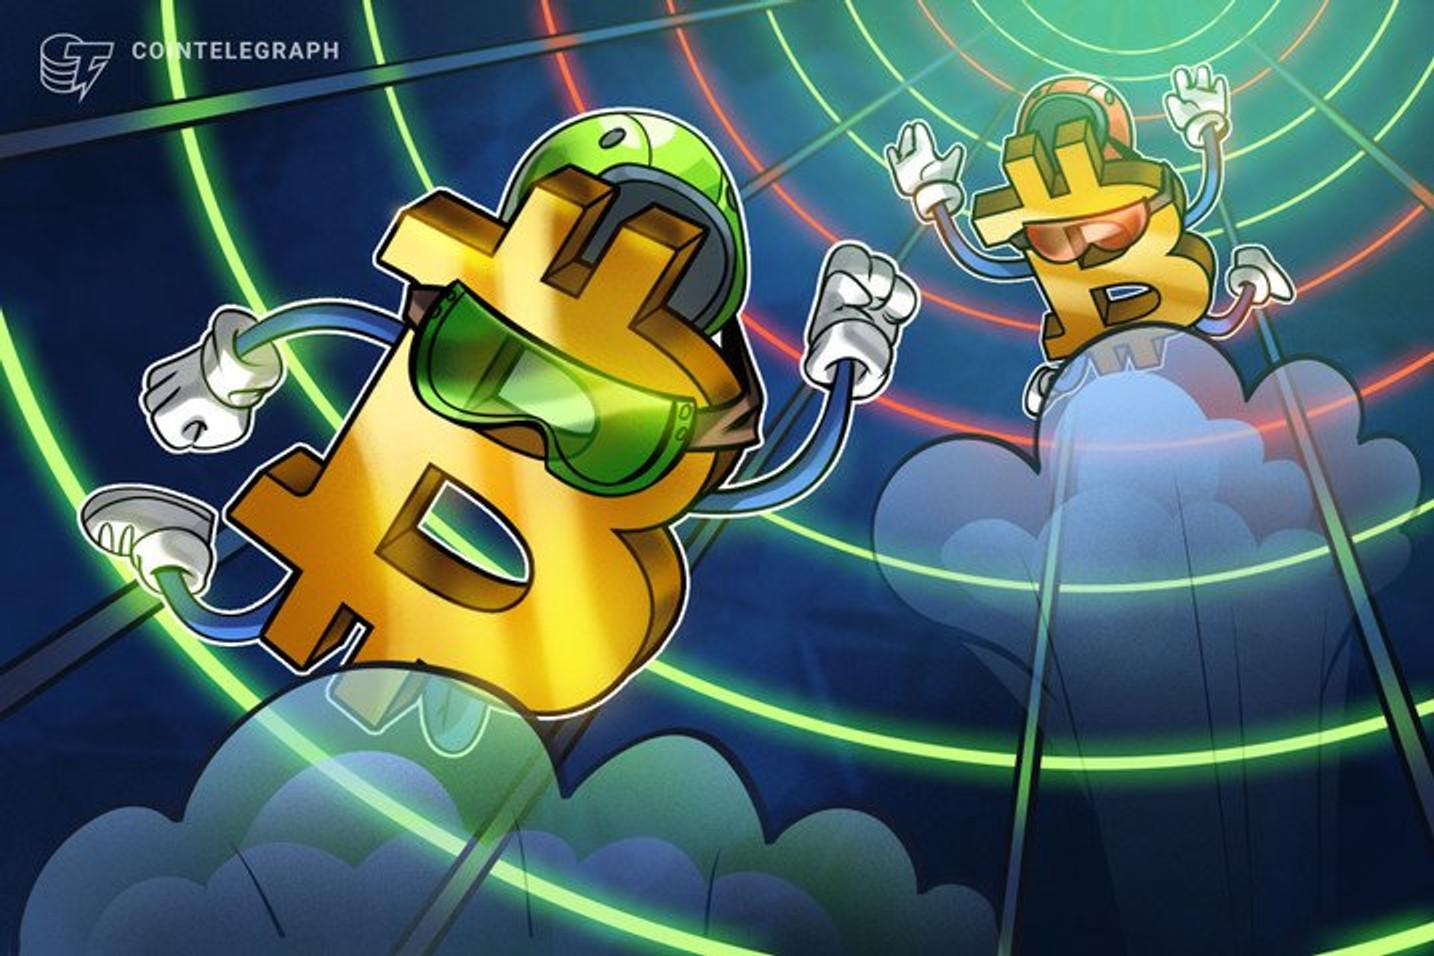 Terceira maior bolsa da Europa, Deutsche Boerse lista ETP baseado em Bitcoin